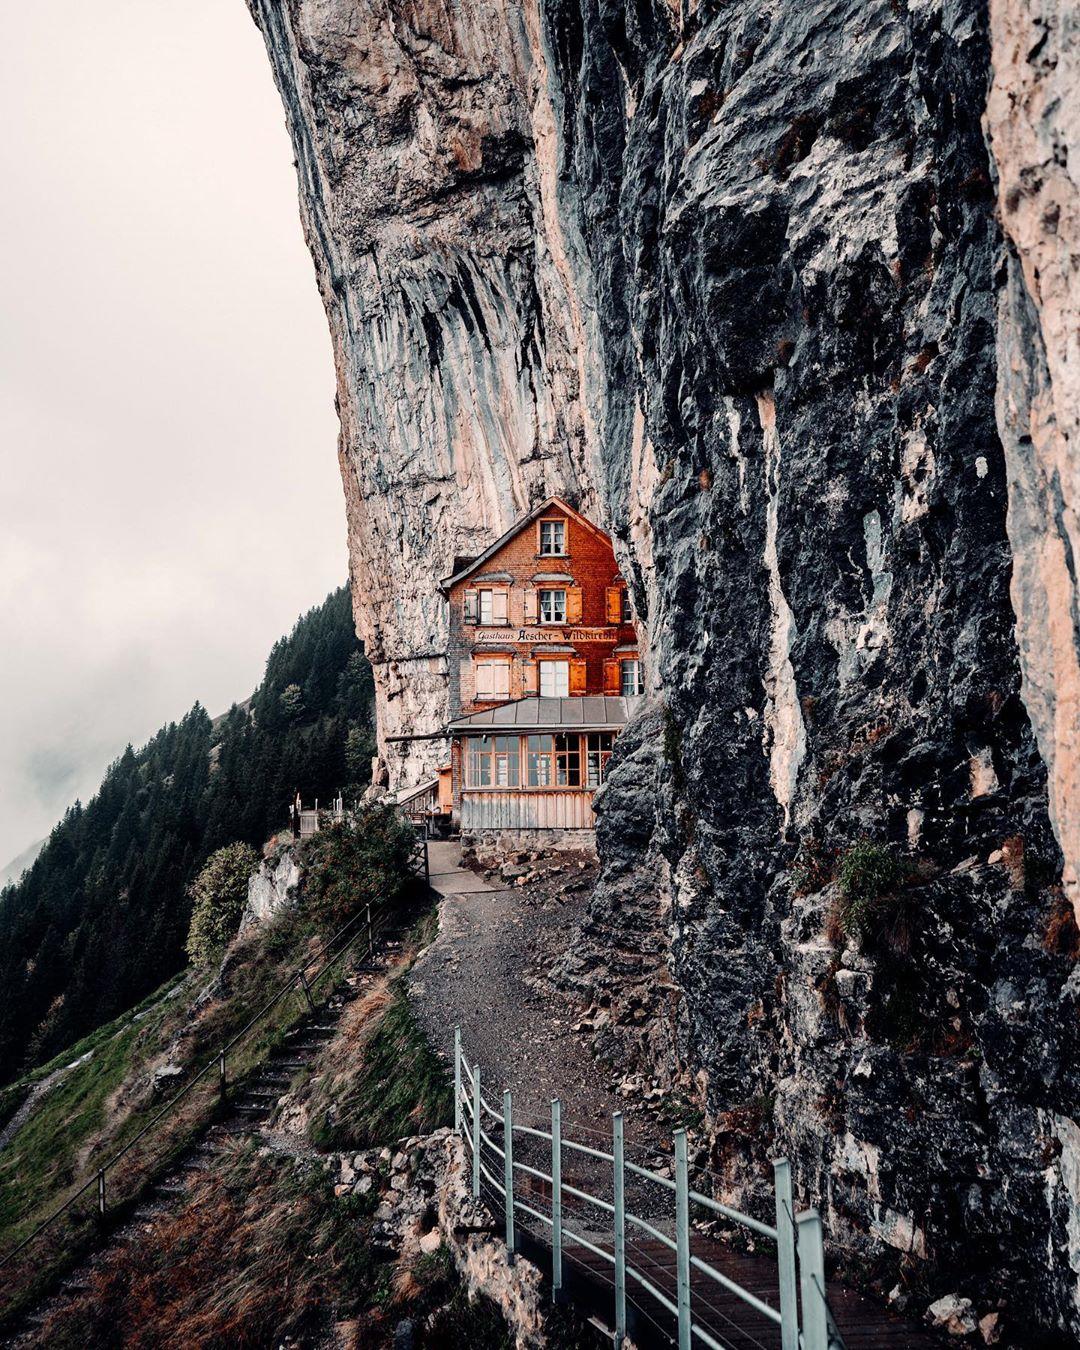 3f6471760bdd4bad97851169a5a5a240?from=pc - 瑞士:一个童话般的国家